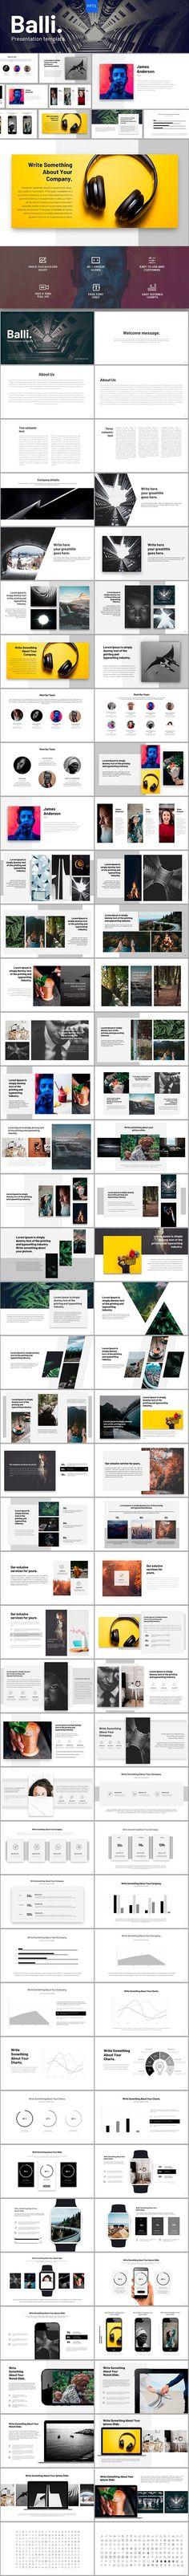 Balli Powerpoint Template - PowerPoint Templates Presentation Templates